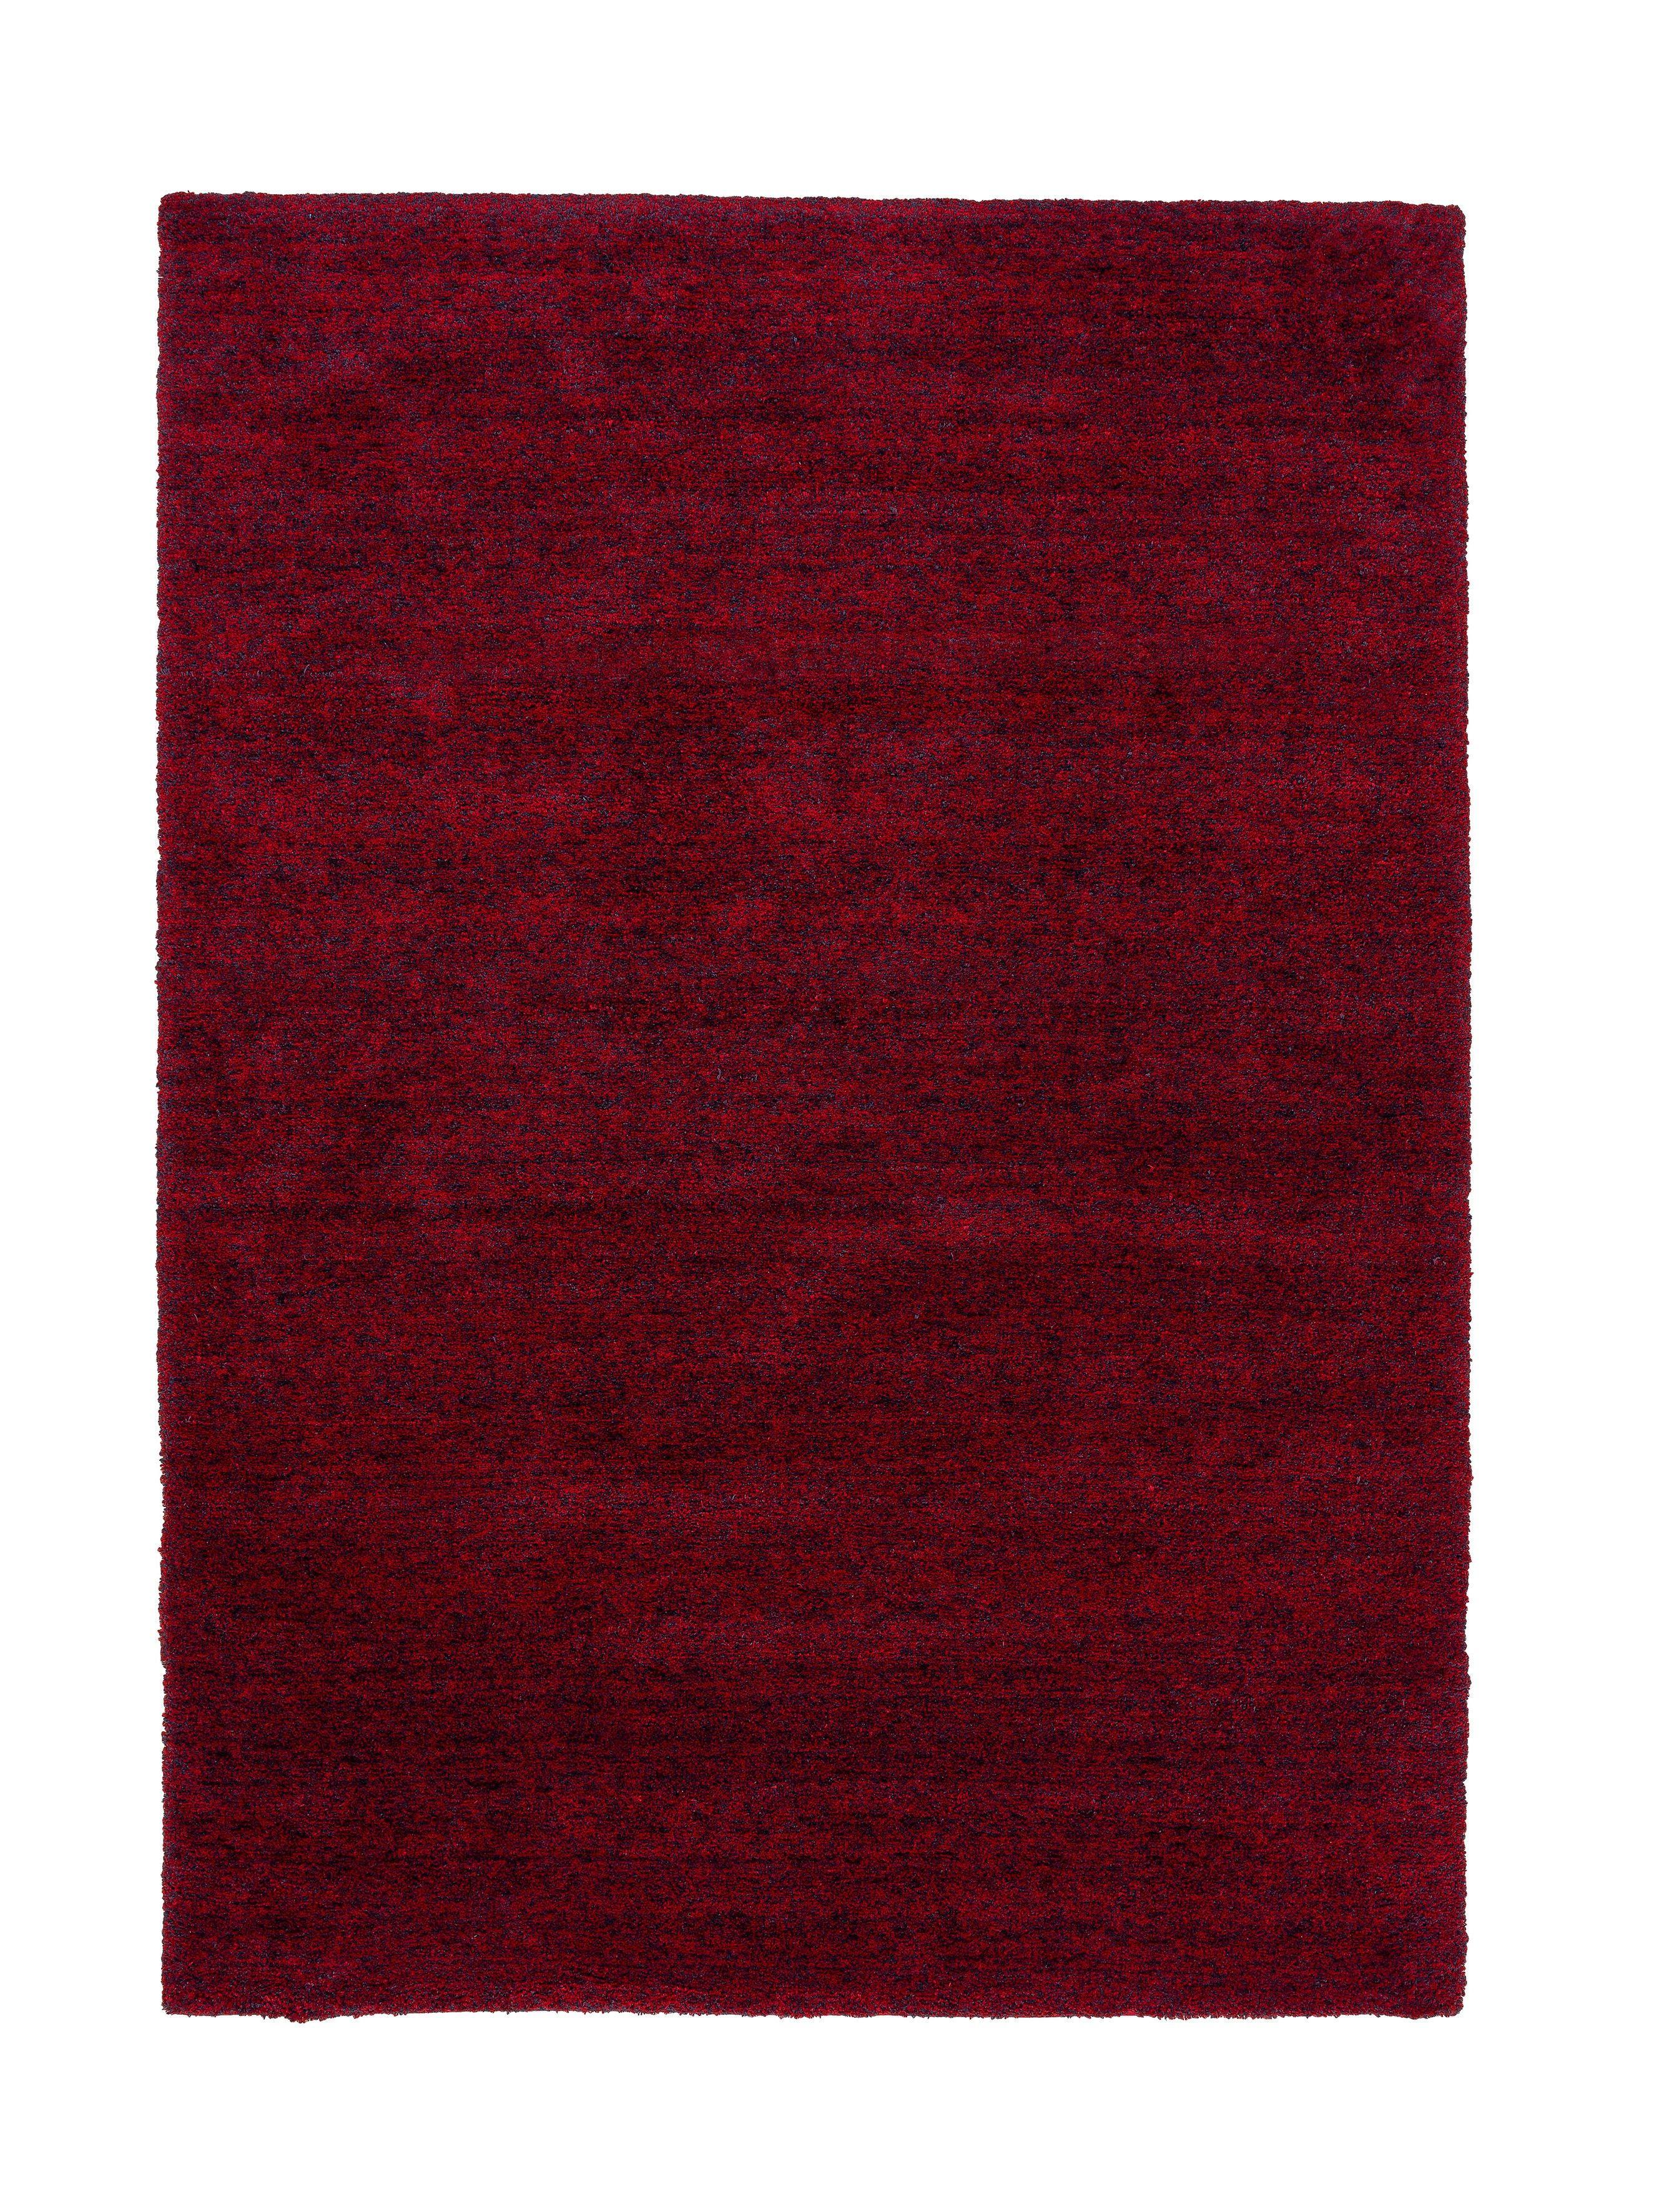 Astra - Golze koberce Kusový koberec Livorno 160011 Mottled Red - 140x200 cm